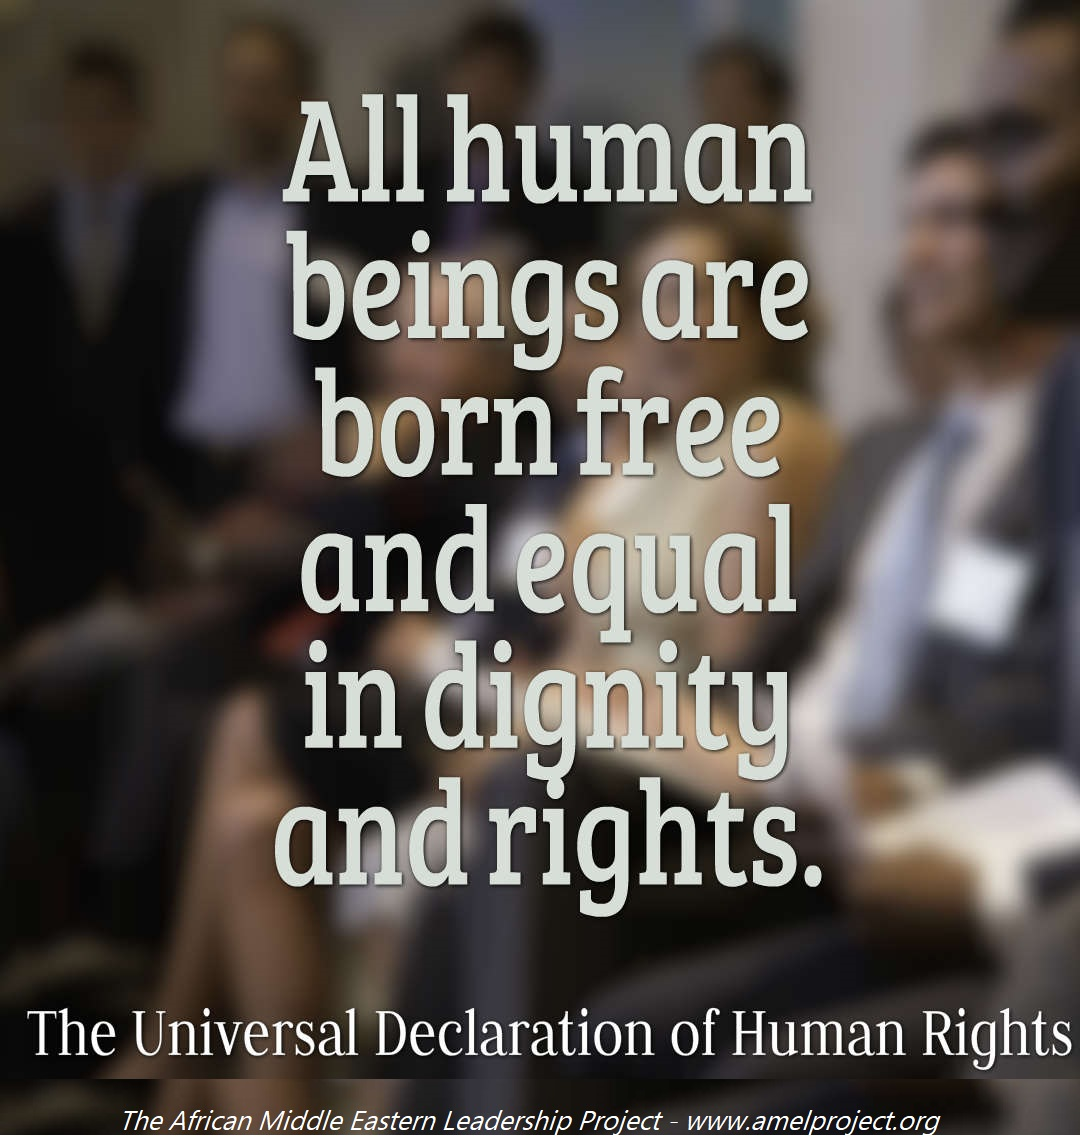 human rights1.jpg